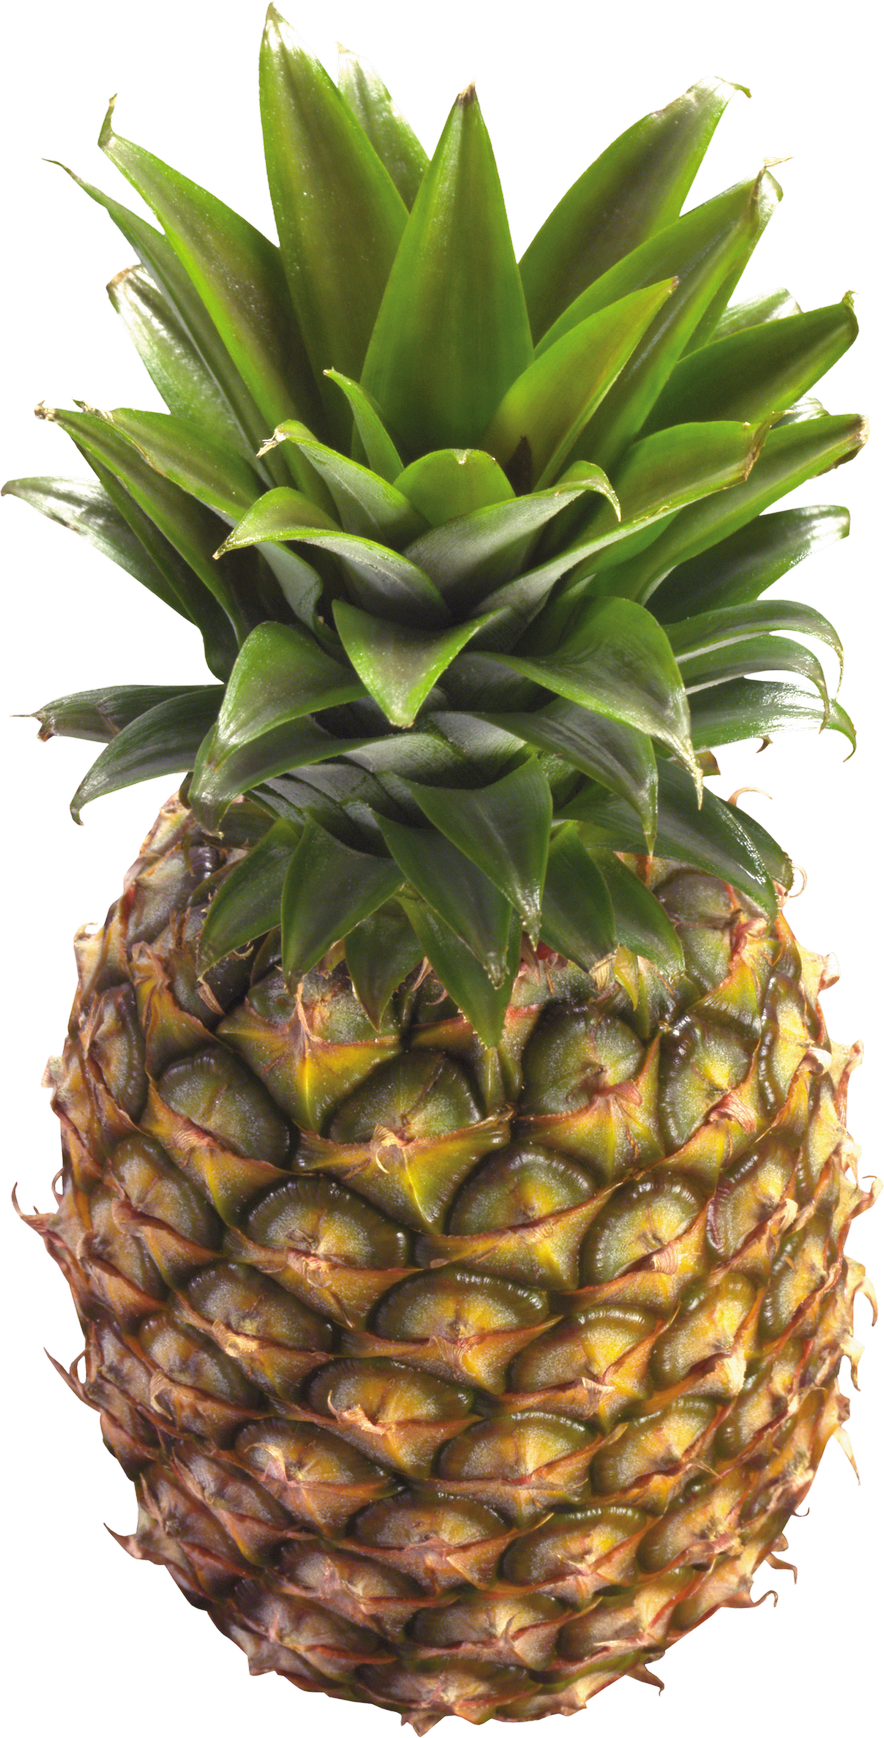 Pineapple PNG Image - PurePNG | Free transparent CC0 PNG ...